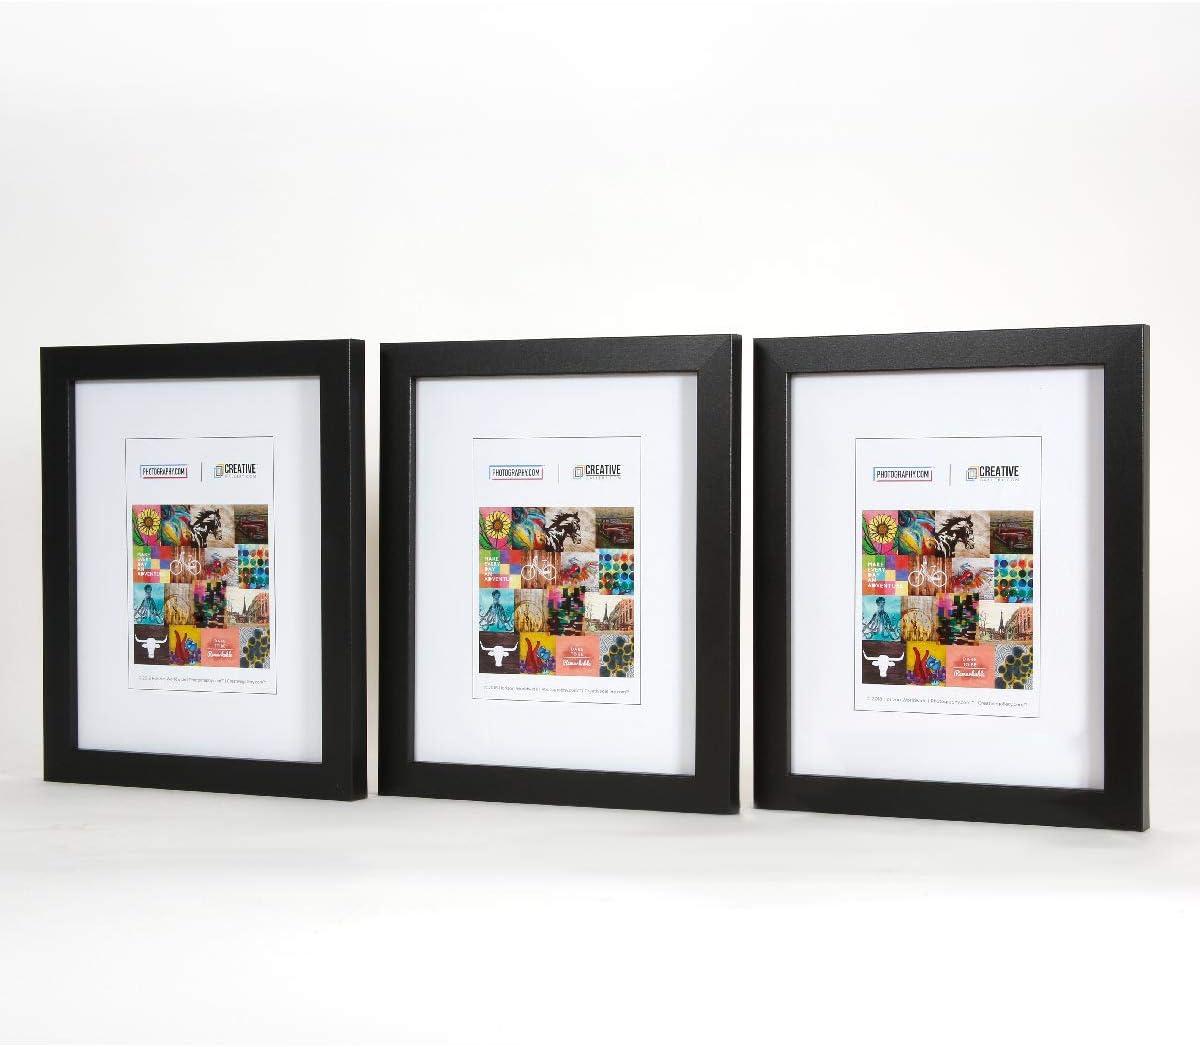 Charcoal Black 8 x 10 size Frames Wholesale Bulk Lots Bundle good for Photo Picture prints Poster Canvas Wall Art Display Decoration